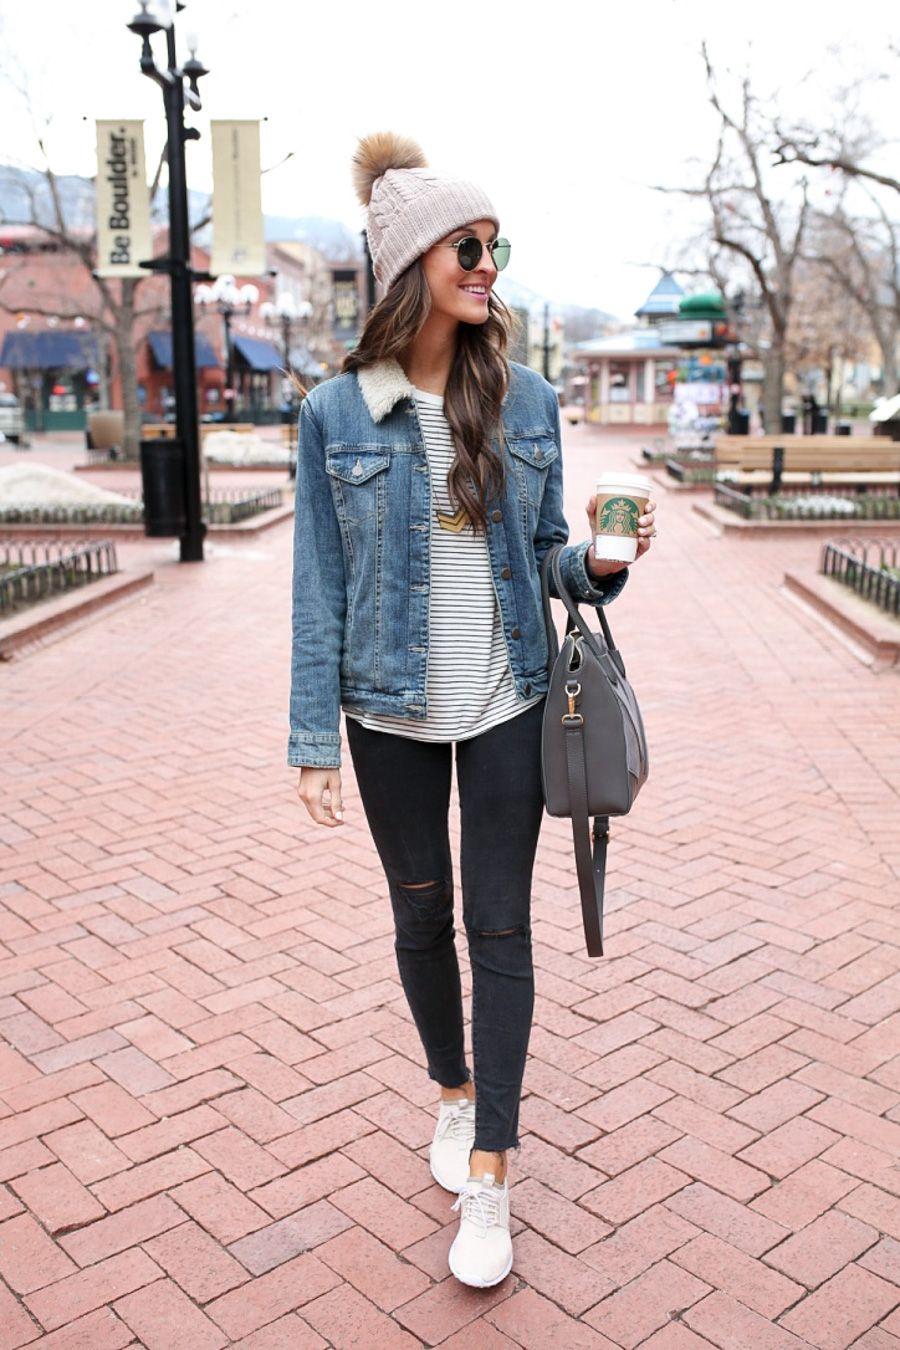 Sneaker girl all day everyday Garments Pinterest Fashion